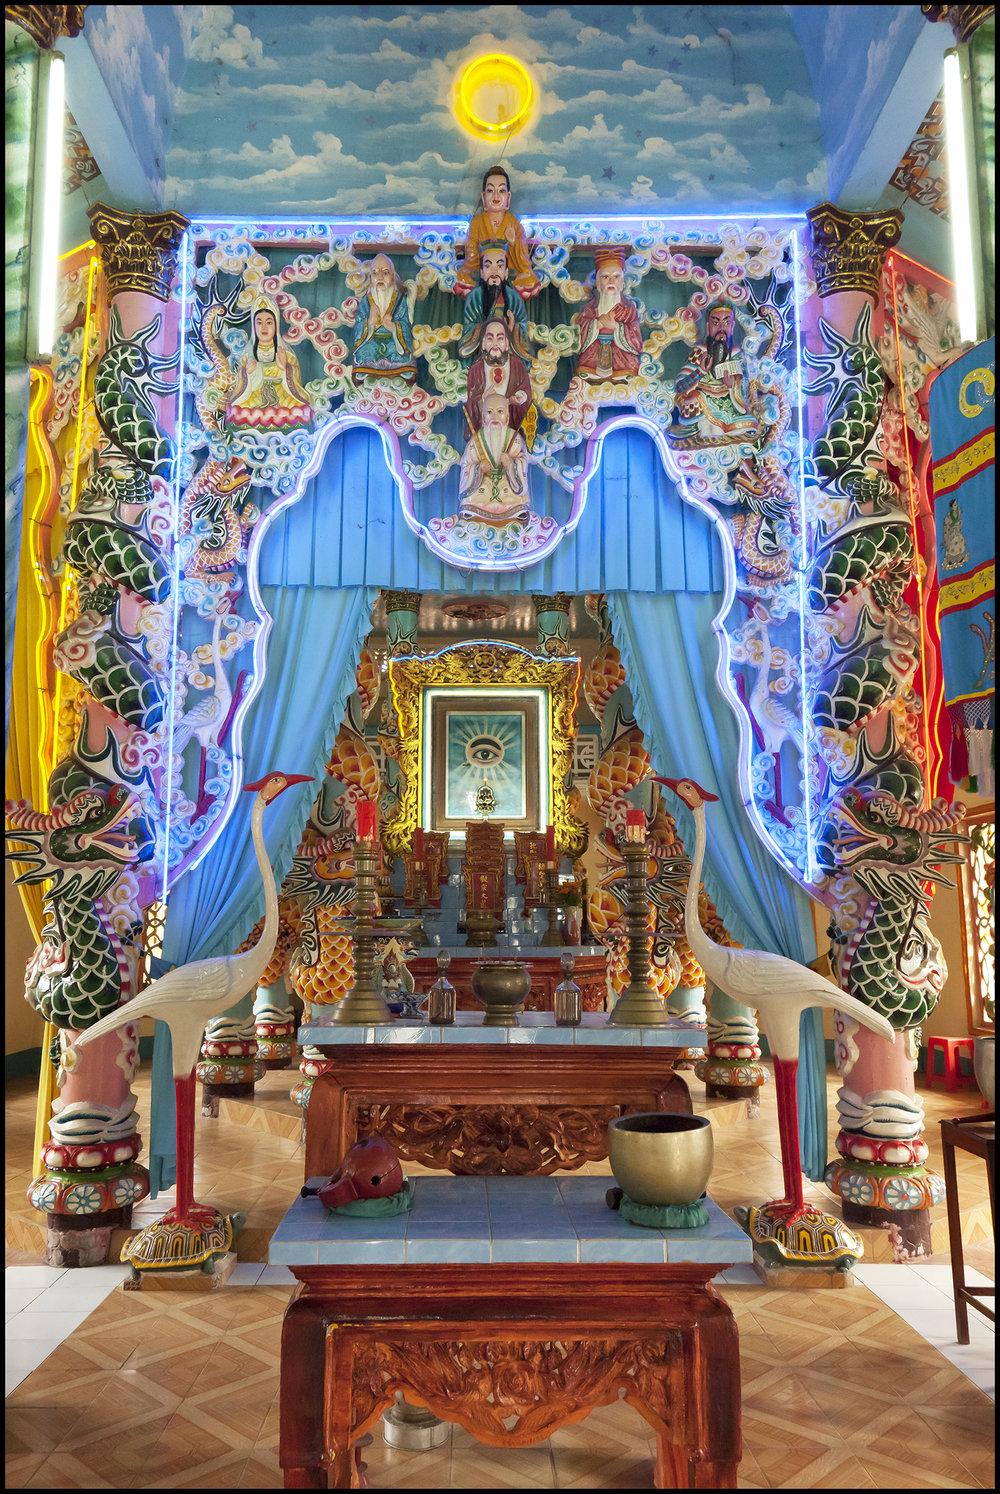 Cao Dai Shrine 10.11.17.jpg